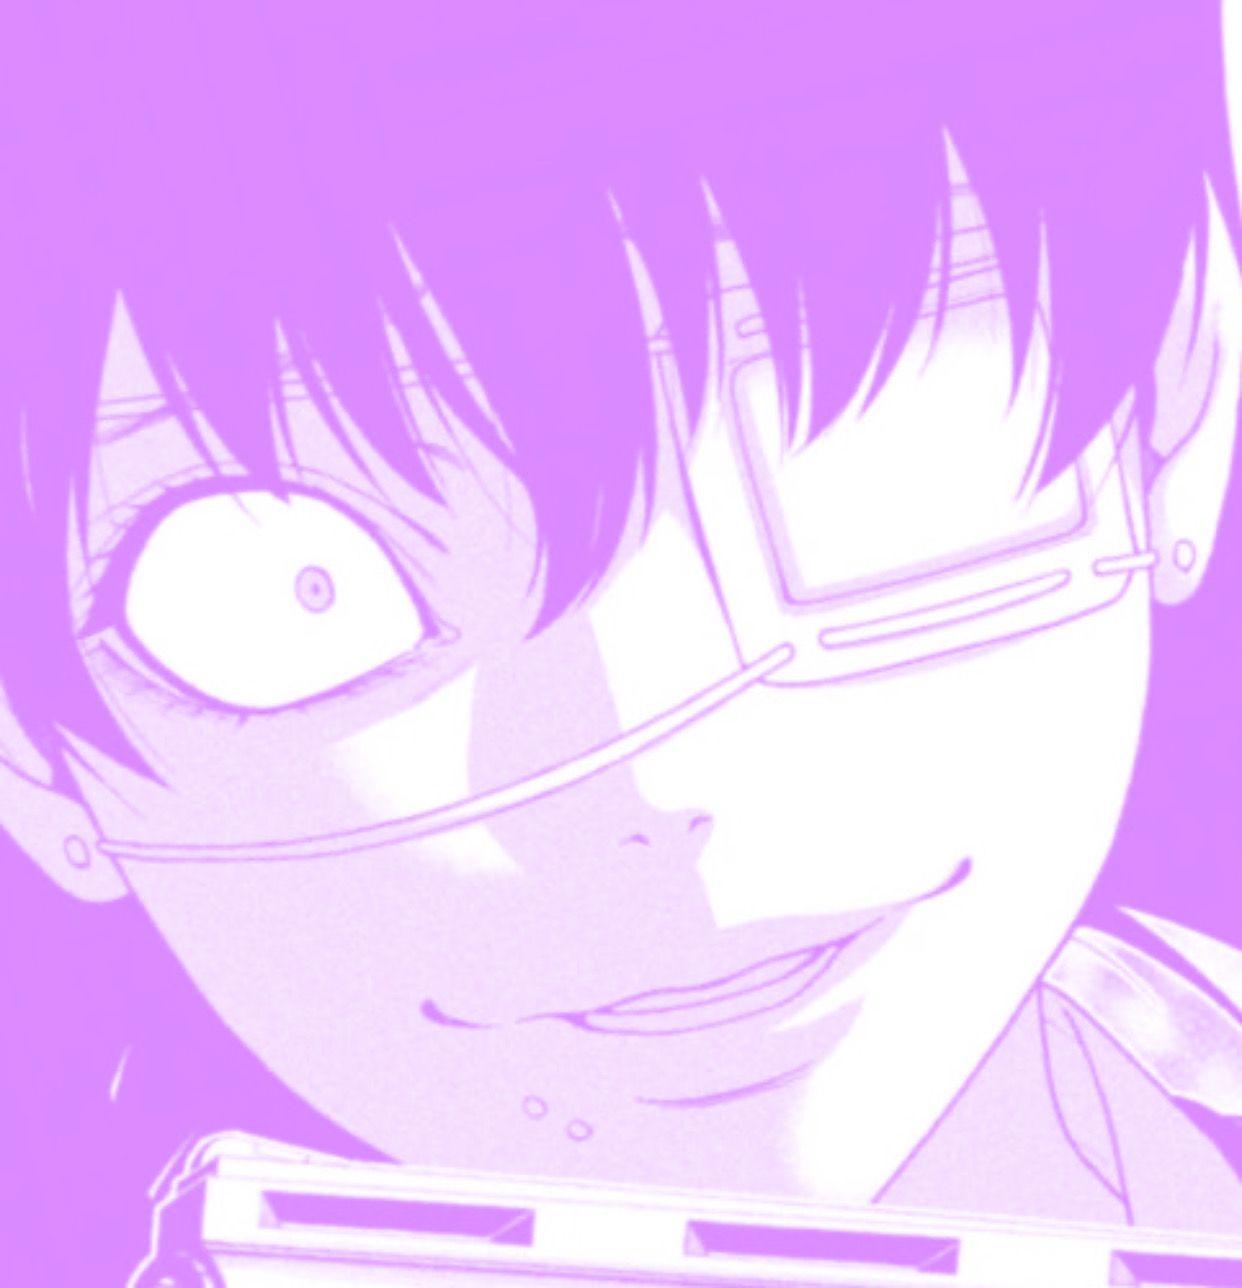 Pin By Kreyger Del Valle On Dibujo Anime Purple Purple Aesthetic Anime Purple Anime Aesthetic Cute anime wallpaper dark purple anime